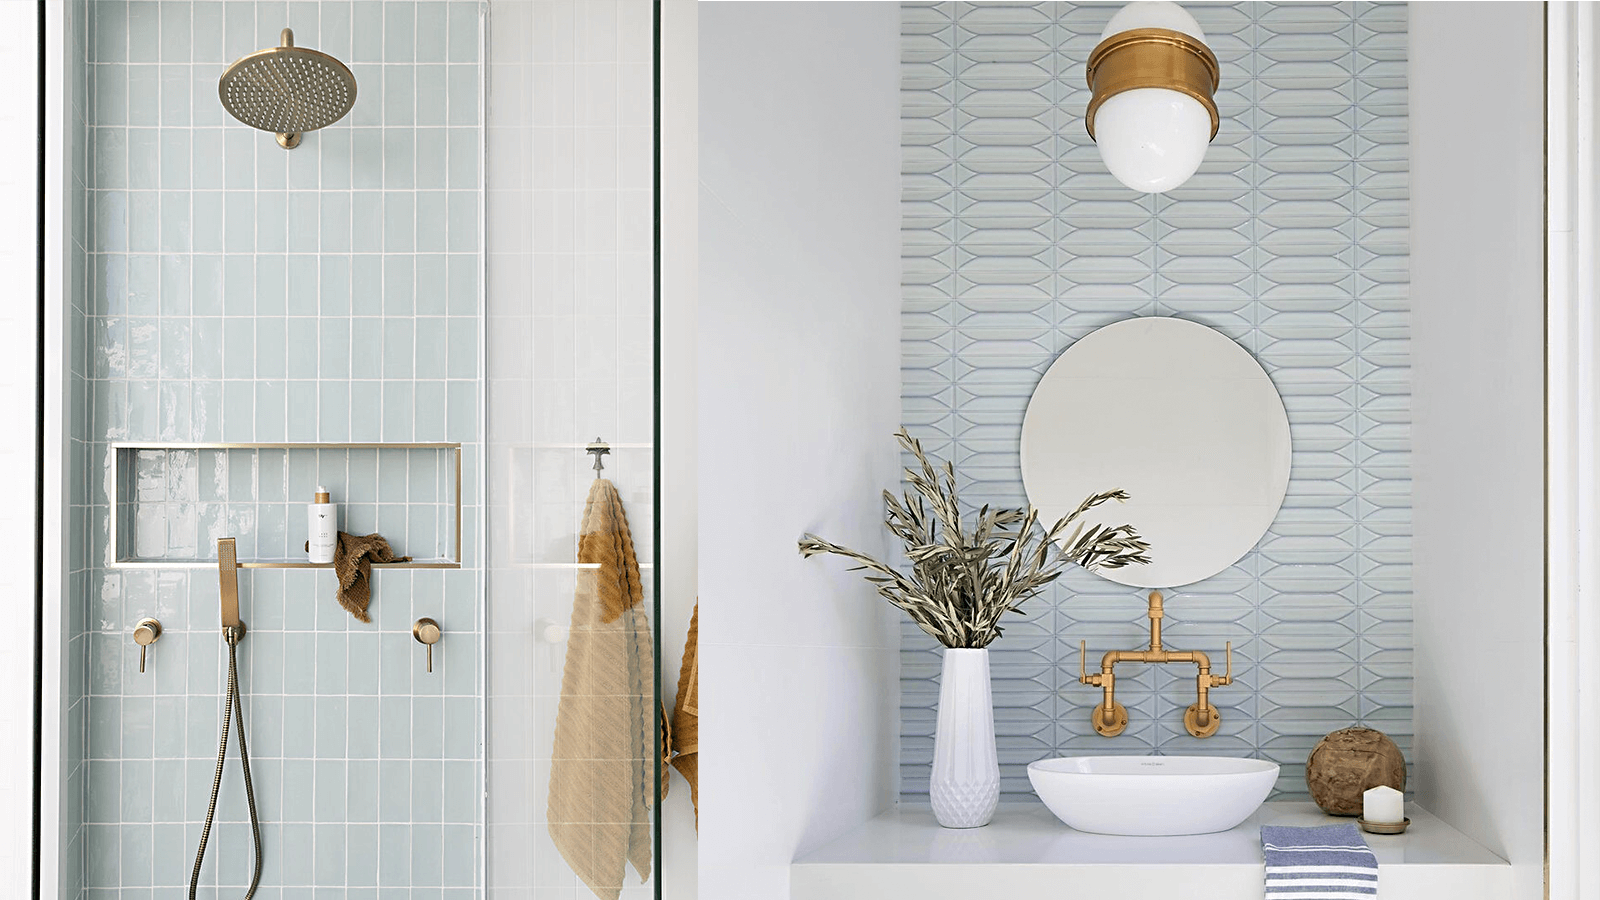 azulejos pisos ceramicos porcelanicos colores pasteles